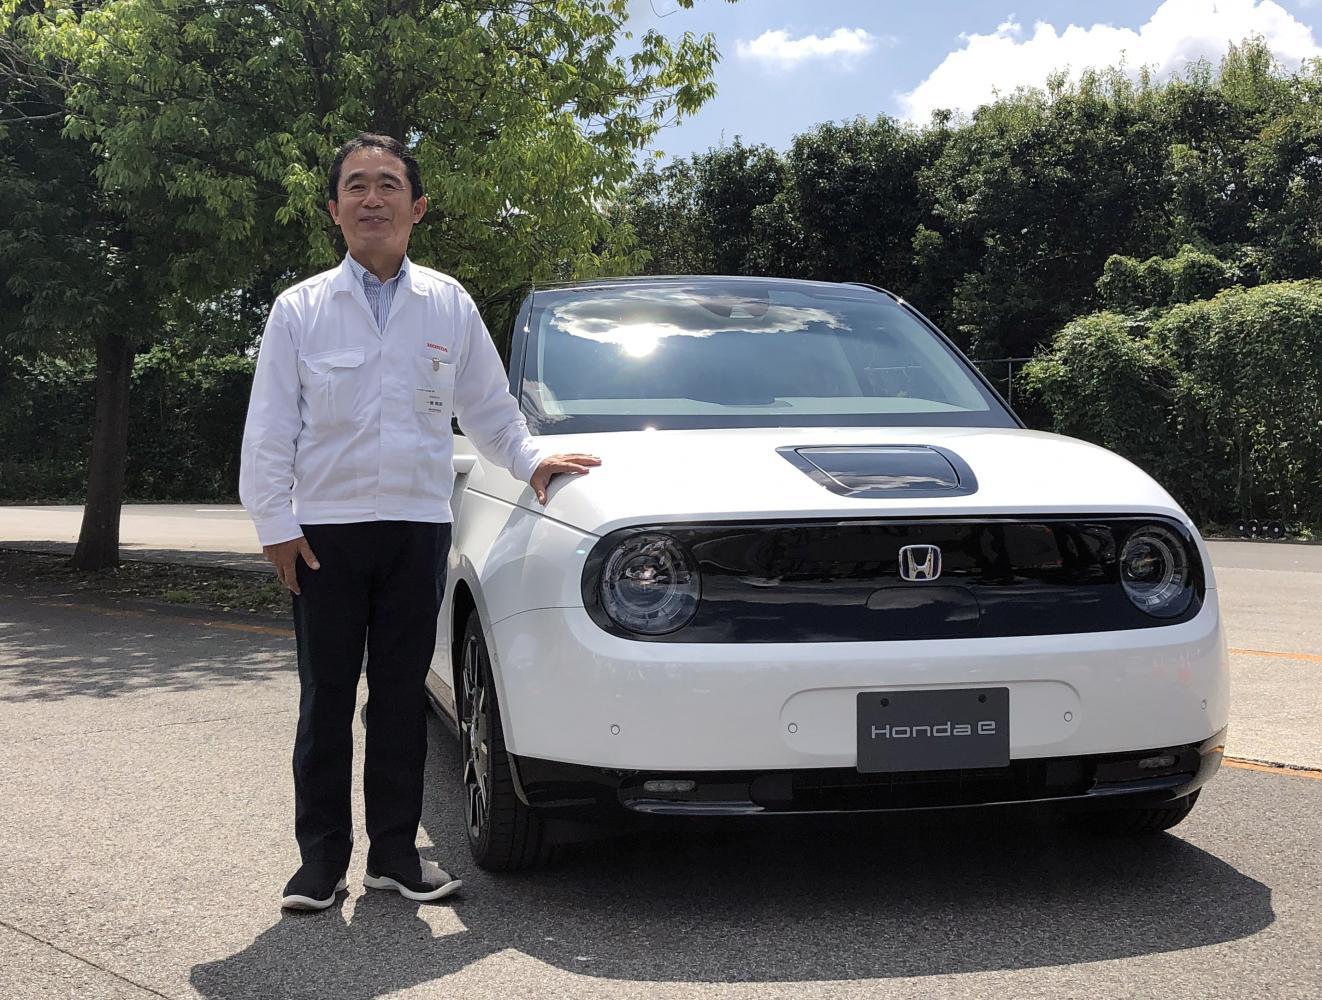 Senior chief engineer Tomofumi Ichinose poses for a photo next to a Honda e electric car.(Reuters photo)